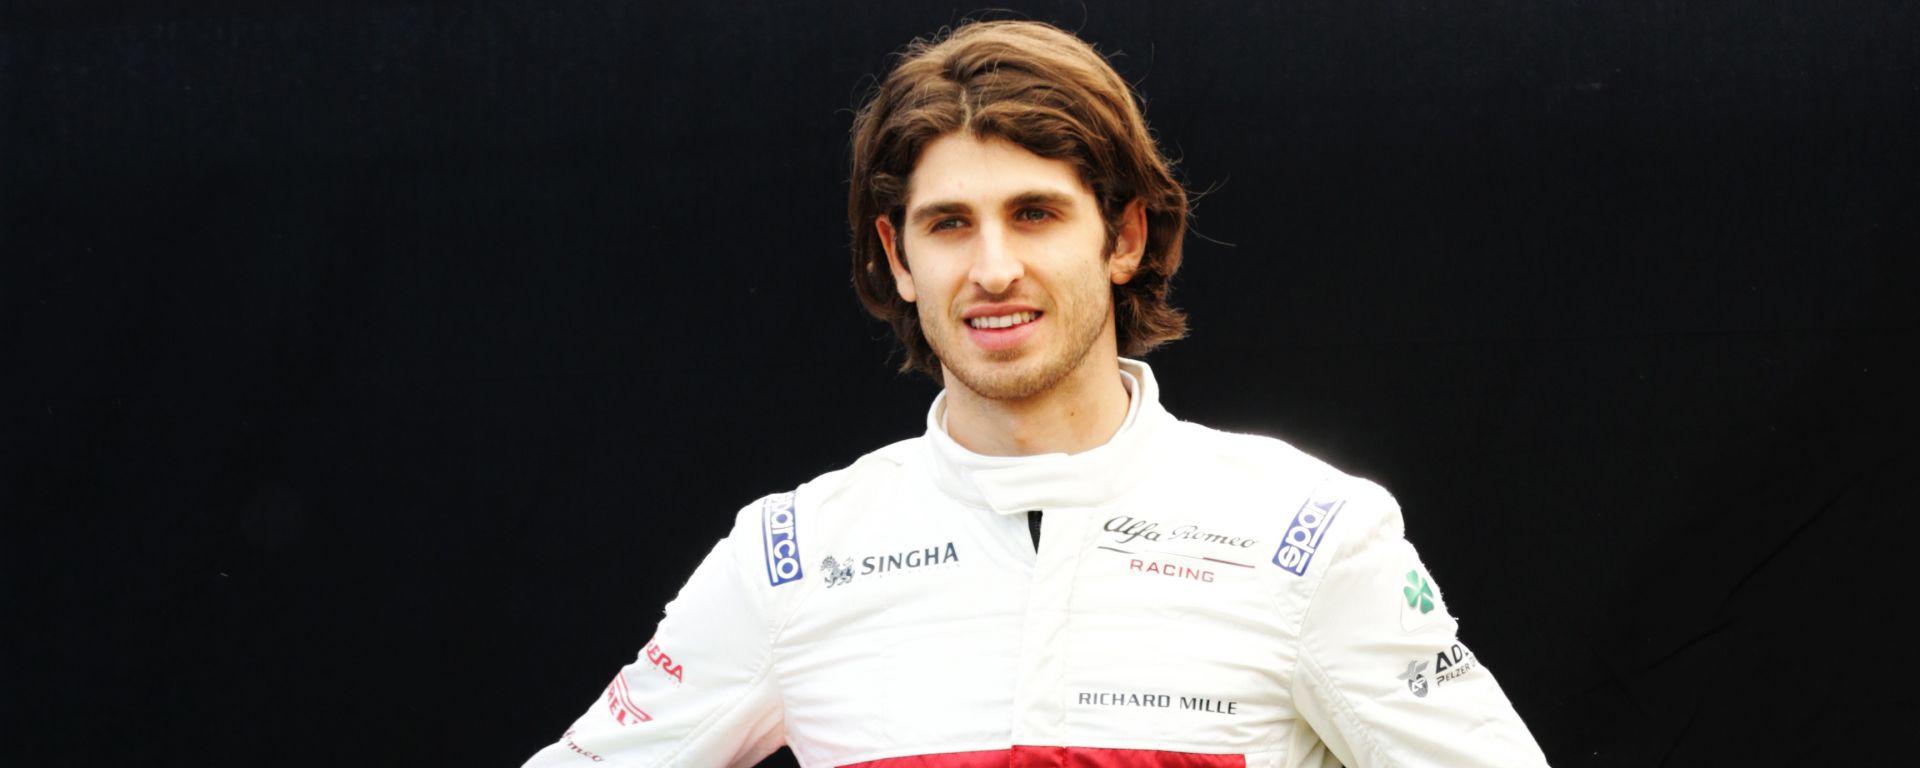 Antonio Giovinazzi #99 F1 2019